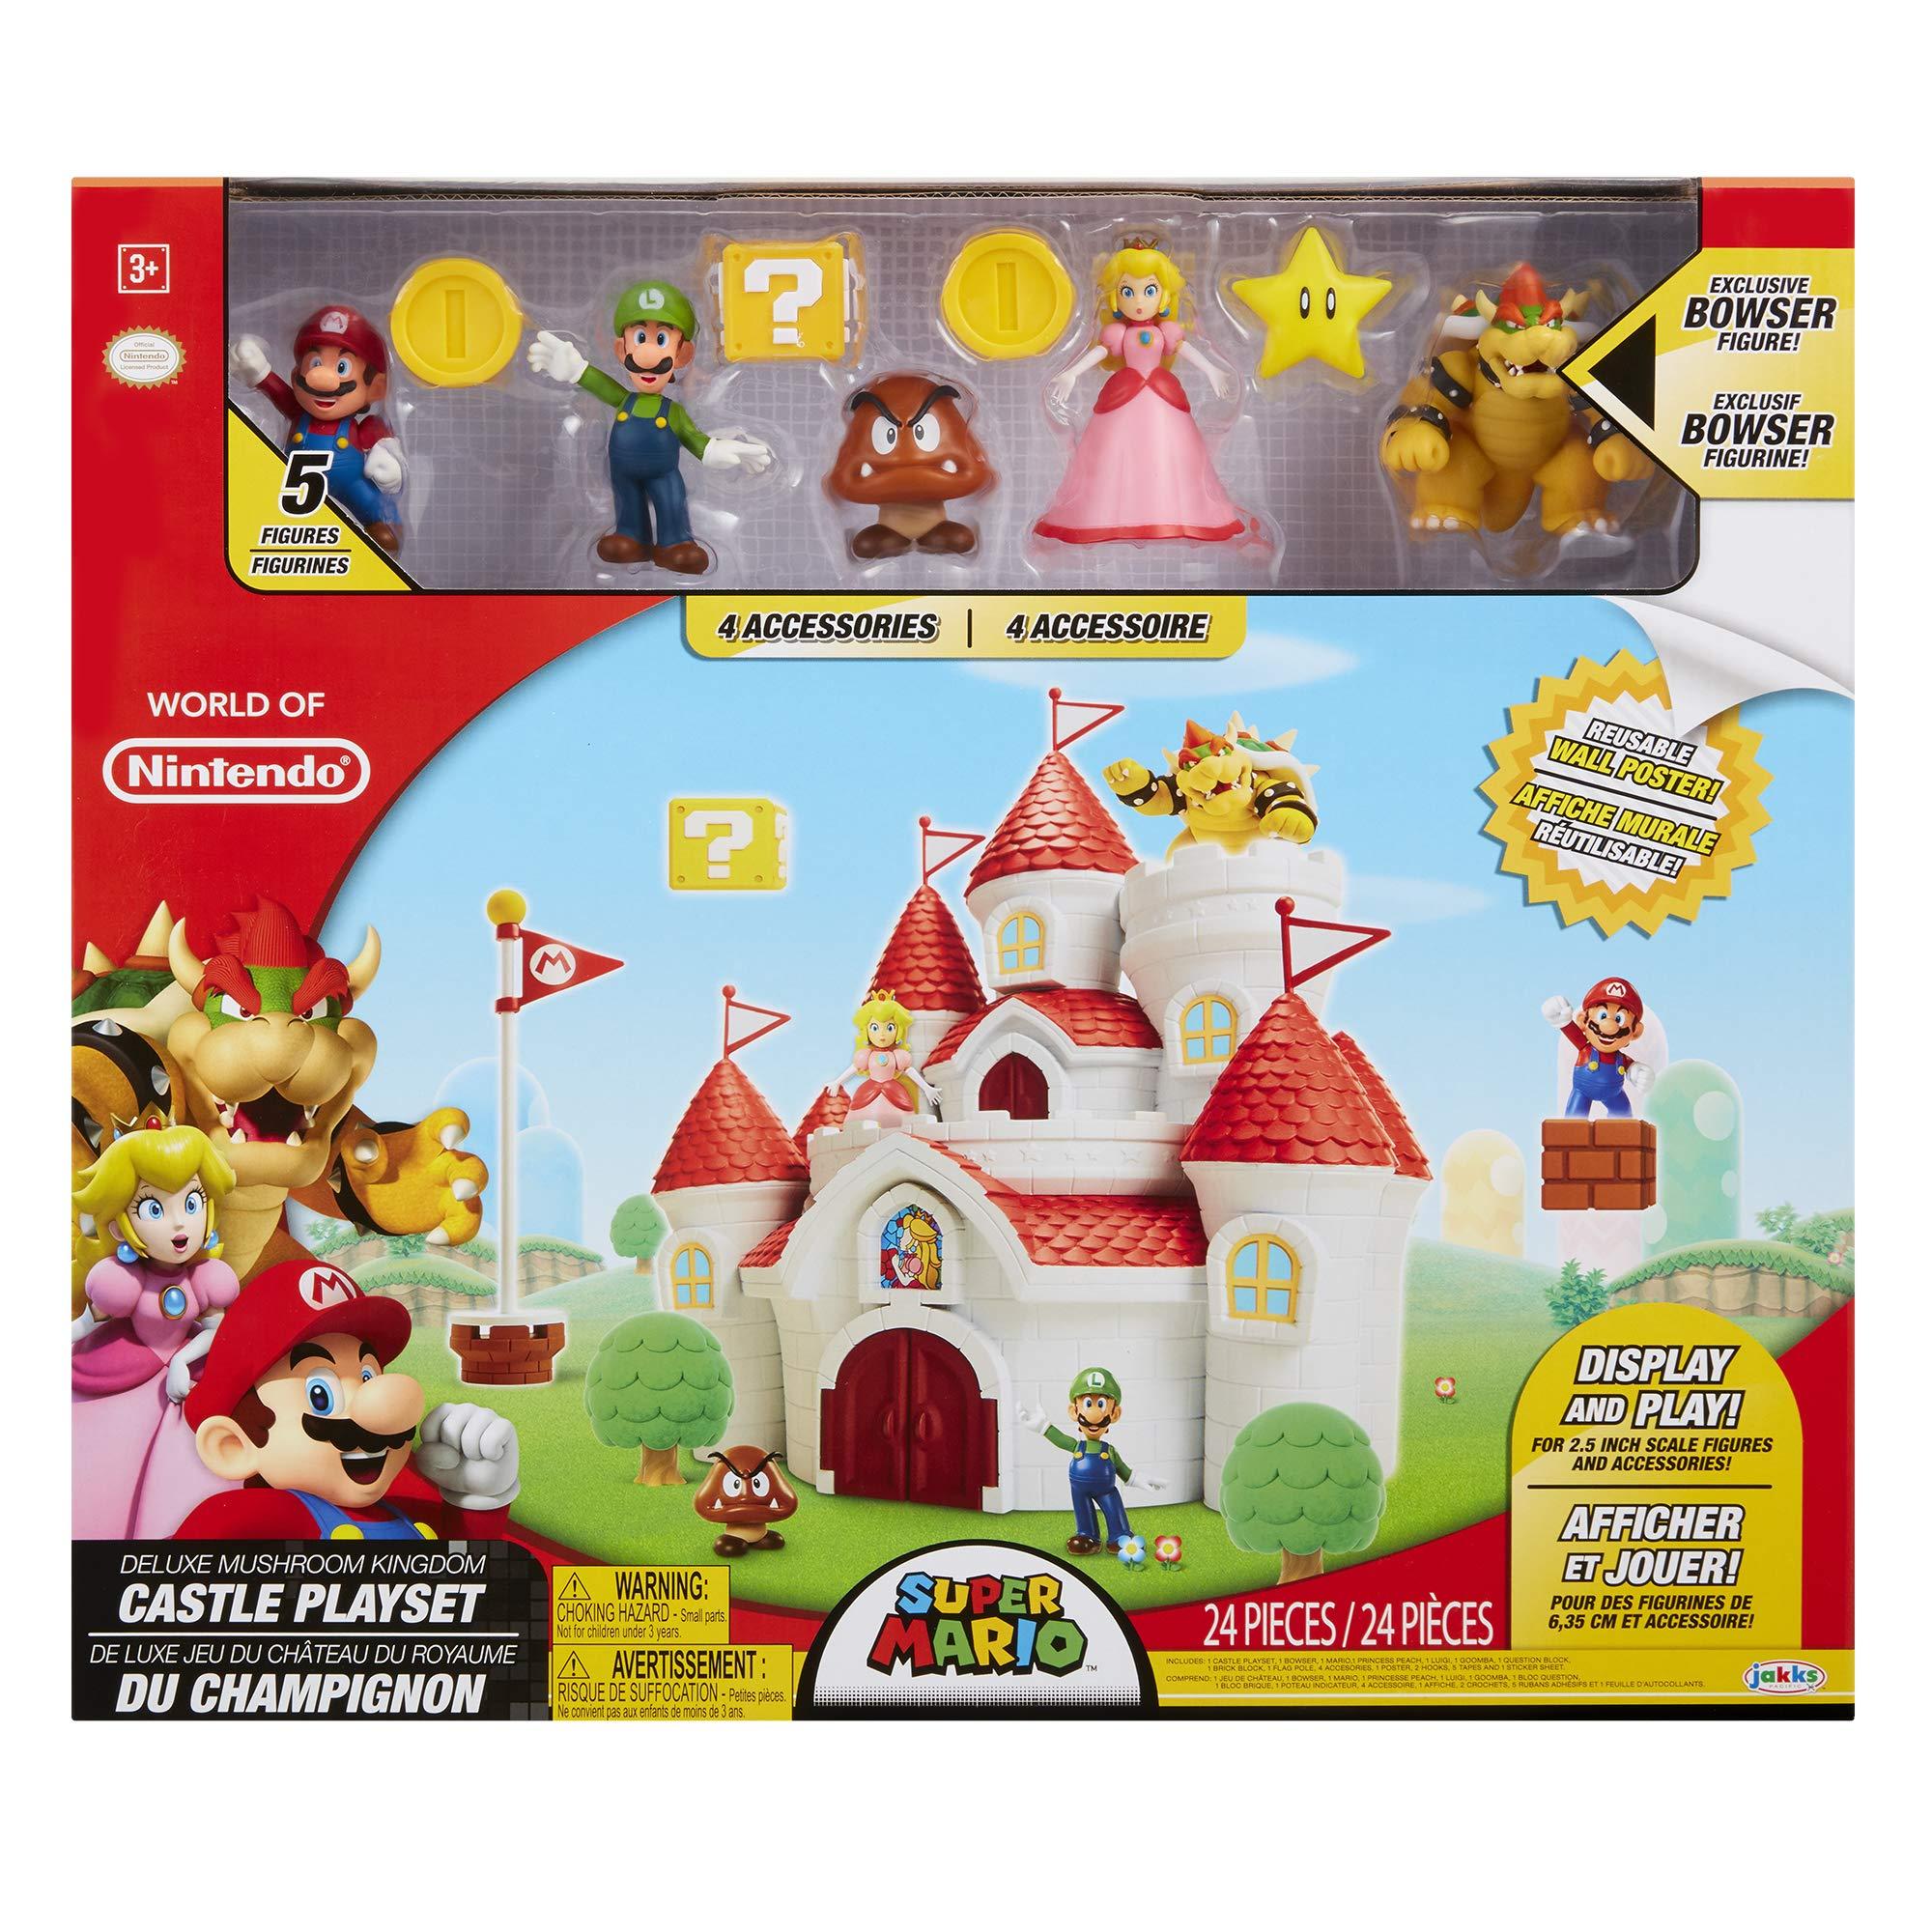 Nintendo Super Mario Deluxe Mushroom Kingdom Castle Playset with 5 Figures & 4 Accessories by Nintendo (Image #5)